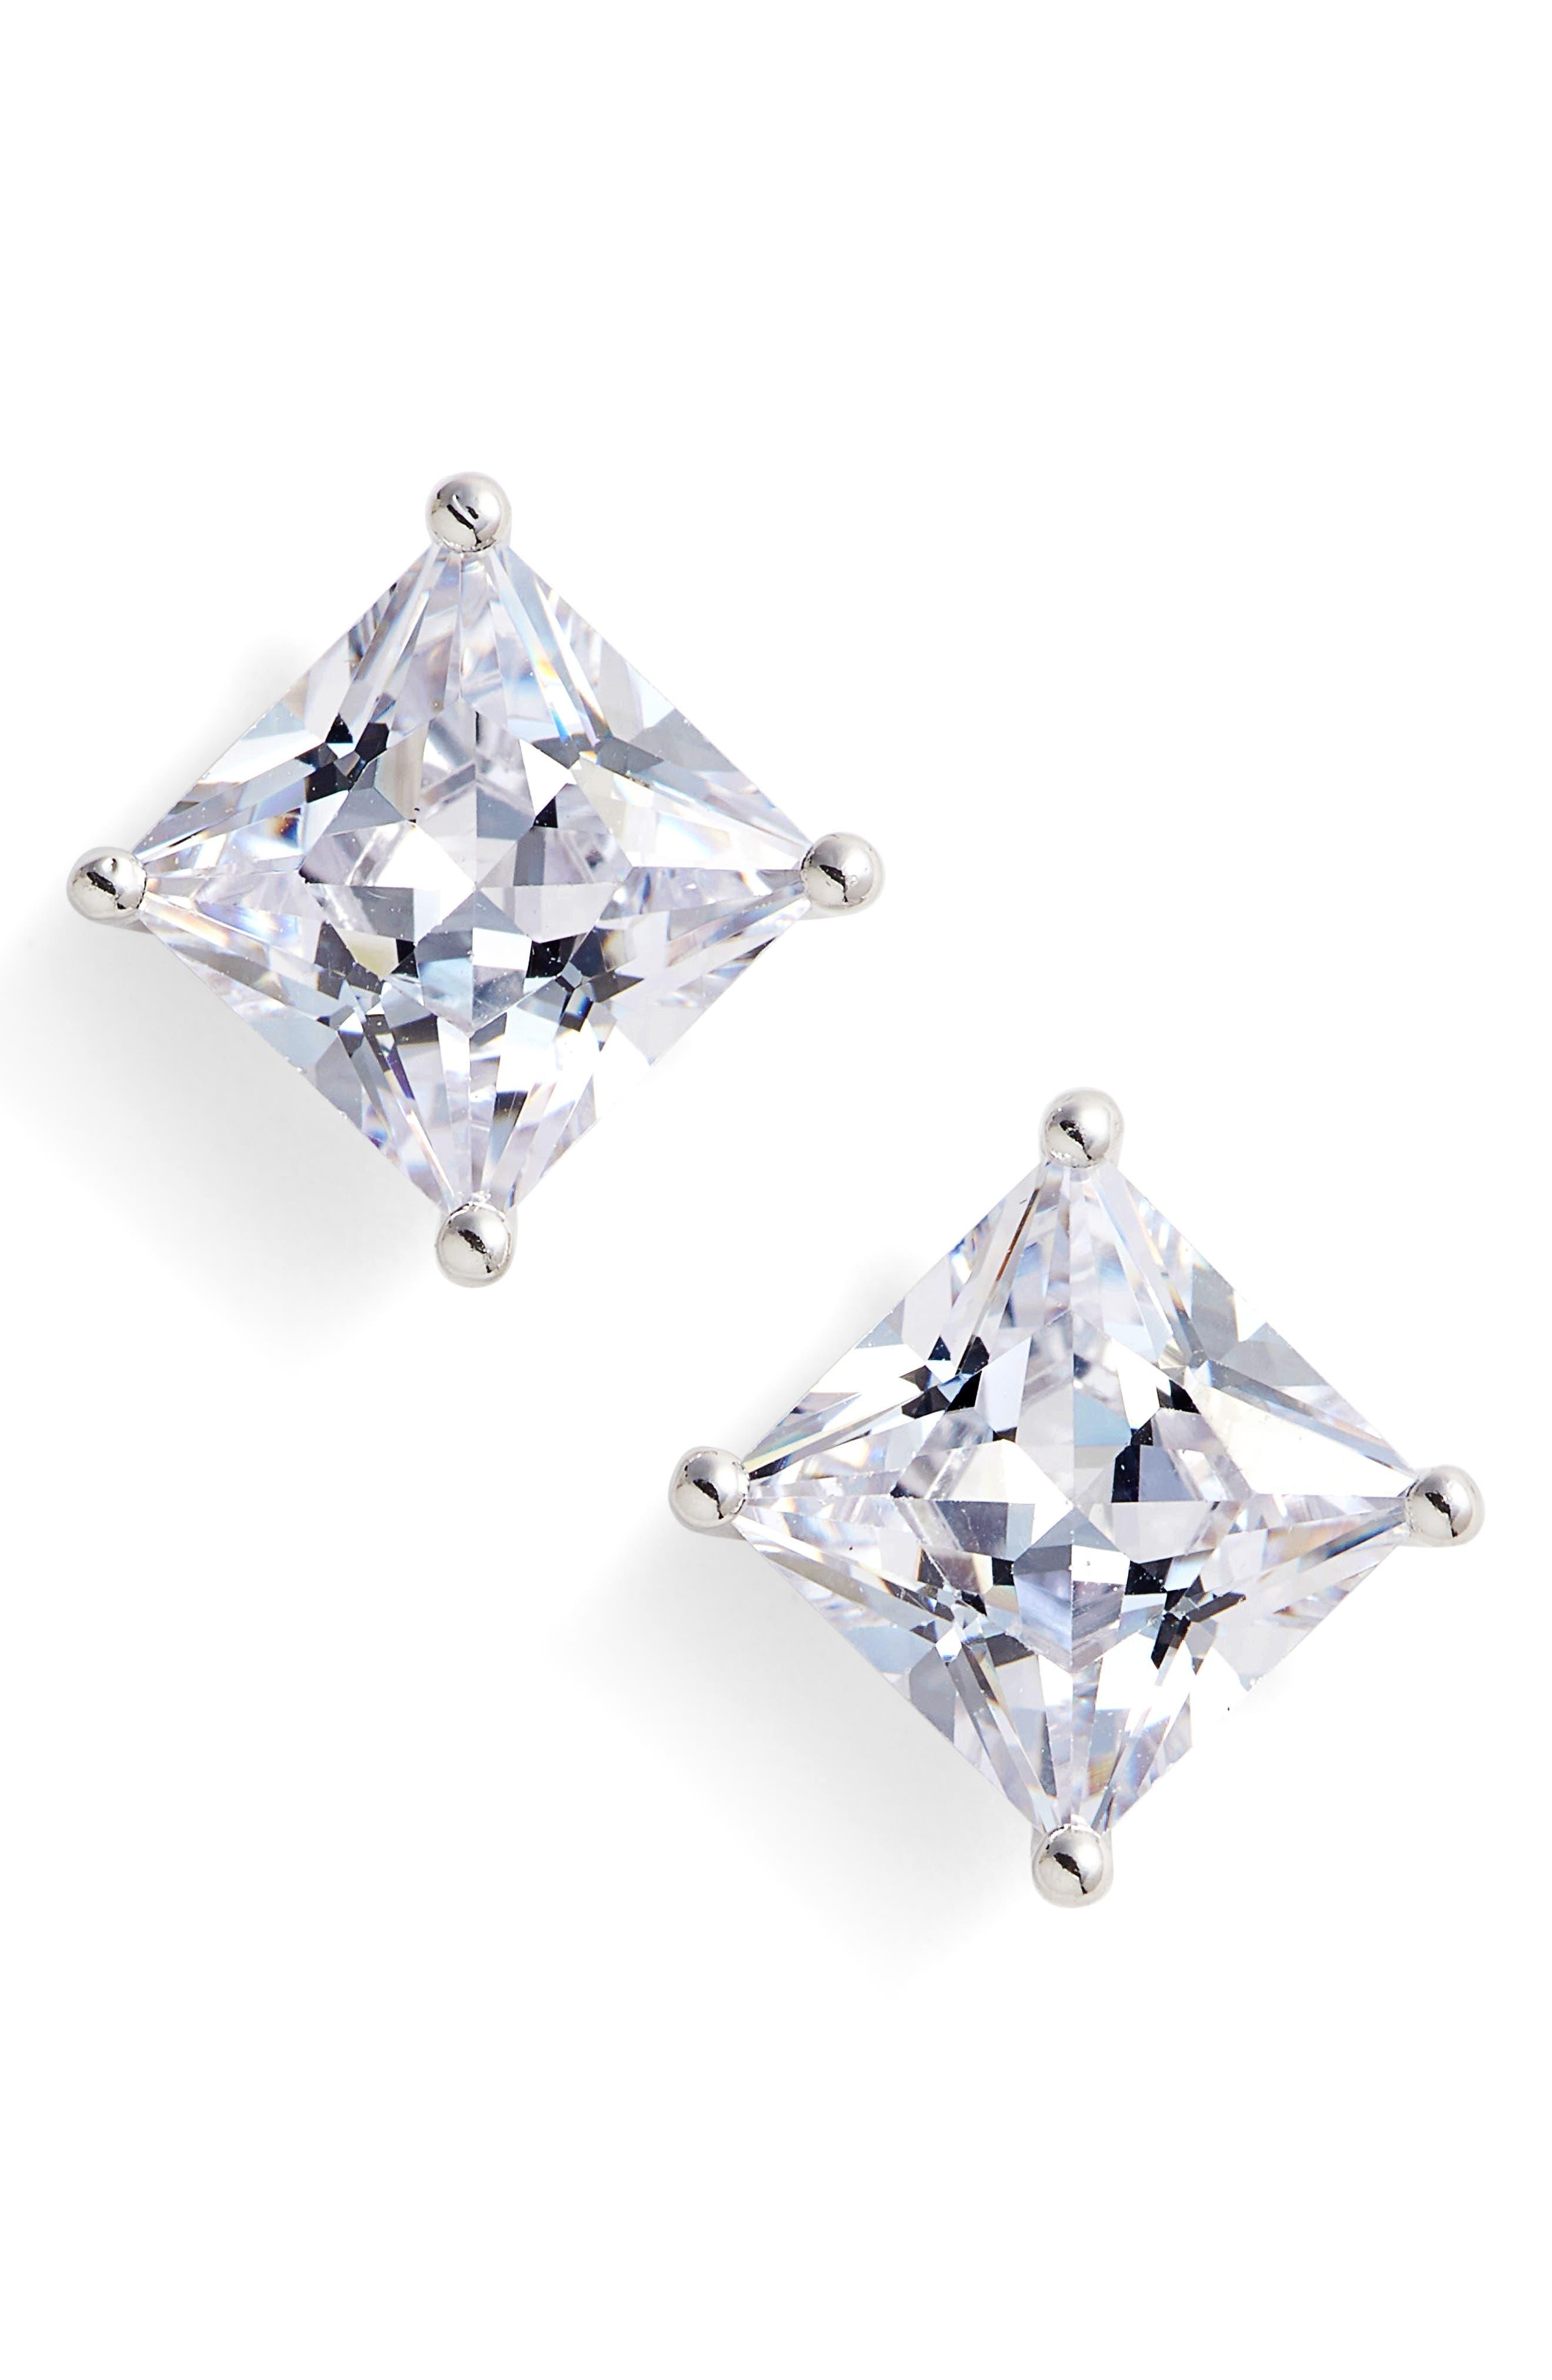 6ct tw Princess Cut Cubic Zirconia Stud Earrings,                         Main,                         color, Platinum